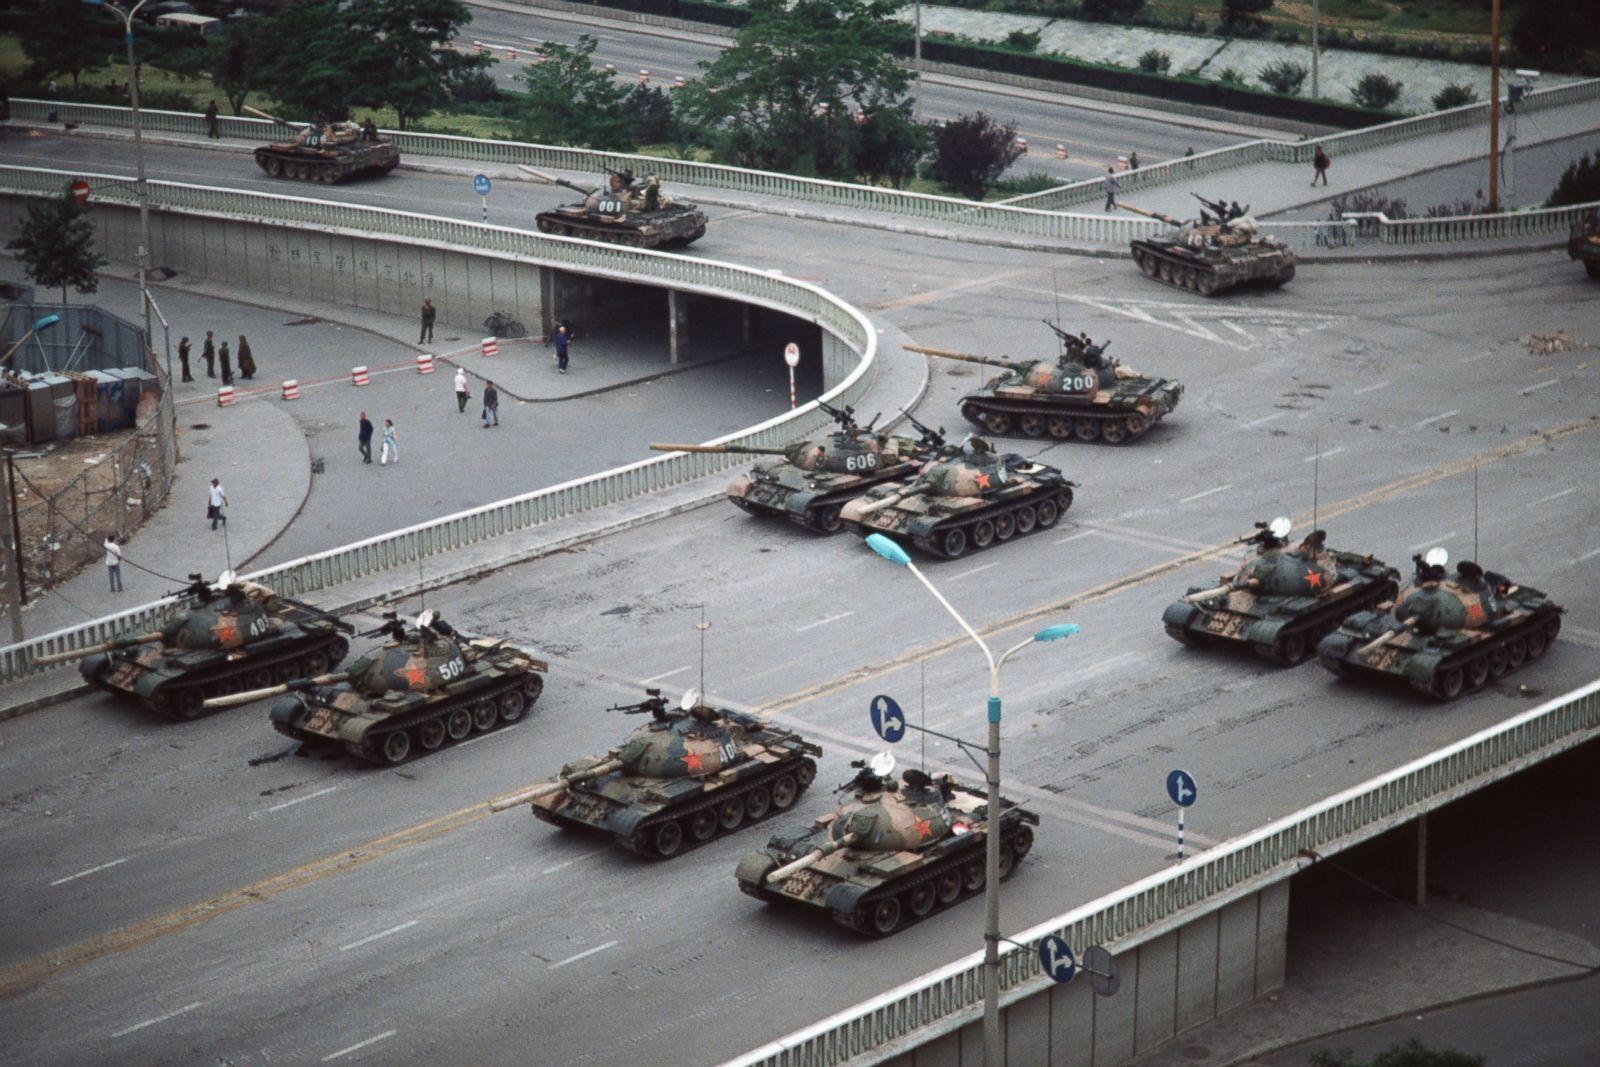 The 1989 Tiananmen Square Massacre? What Massacre?